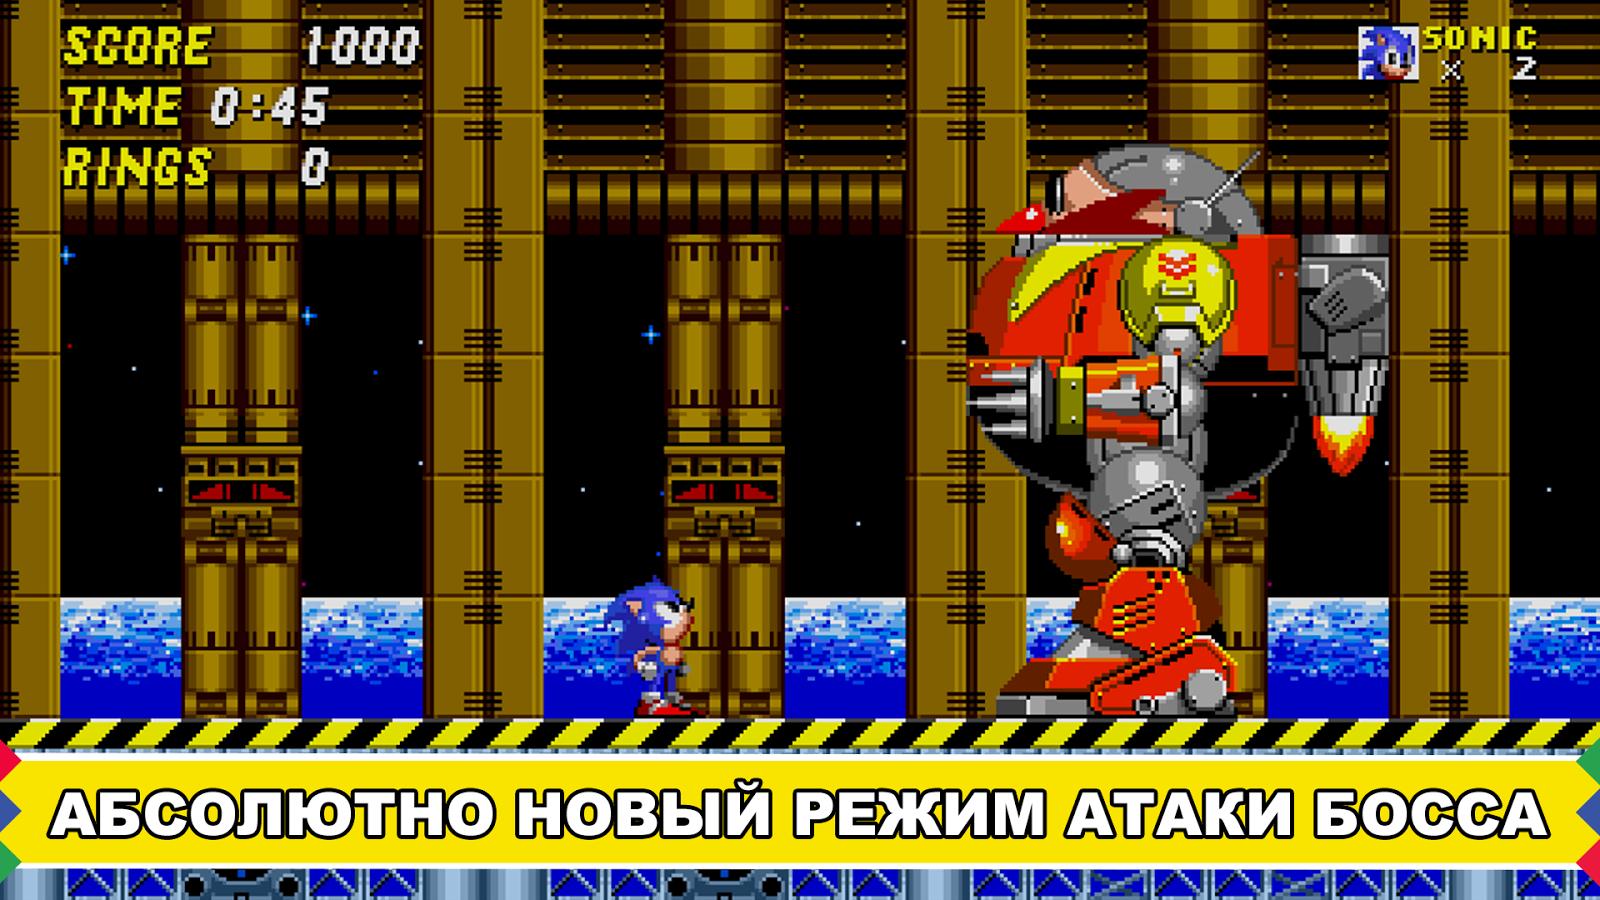 Sonic the hedgehog 3 download game | gamefabrique.